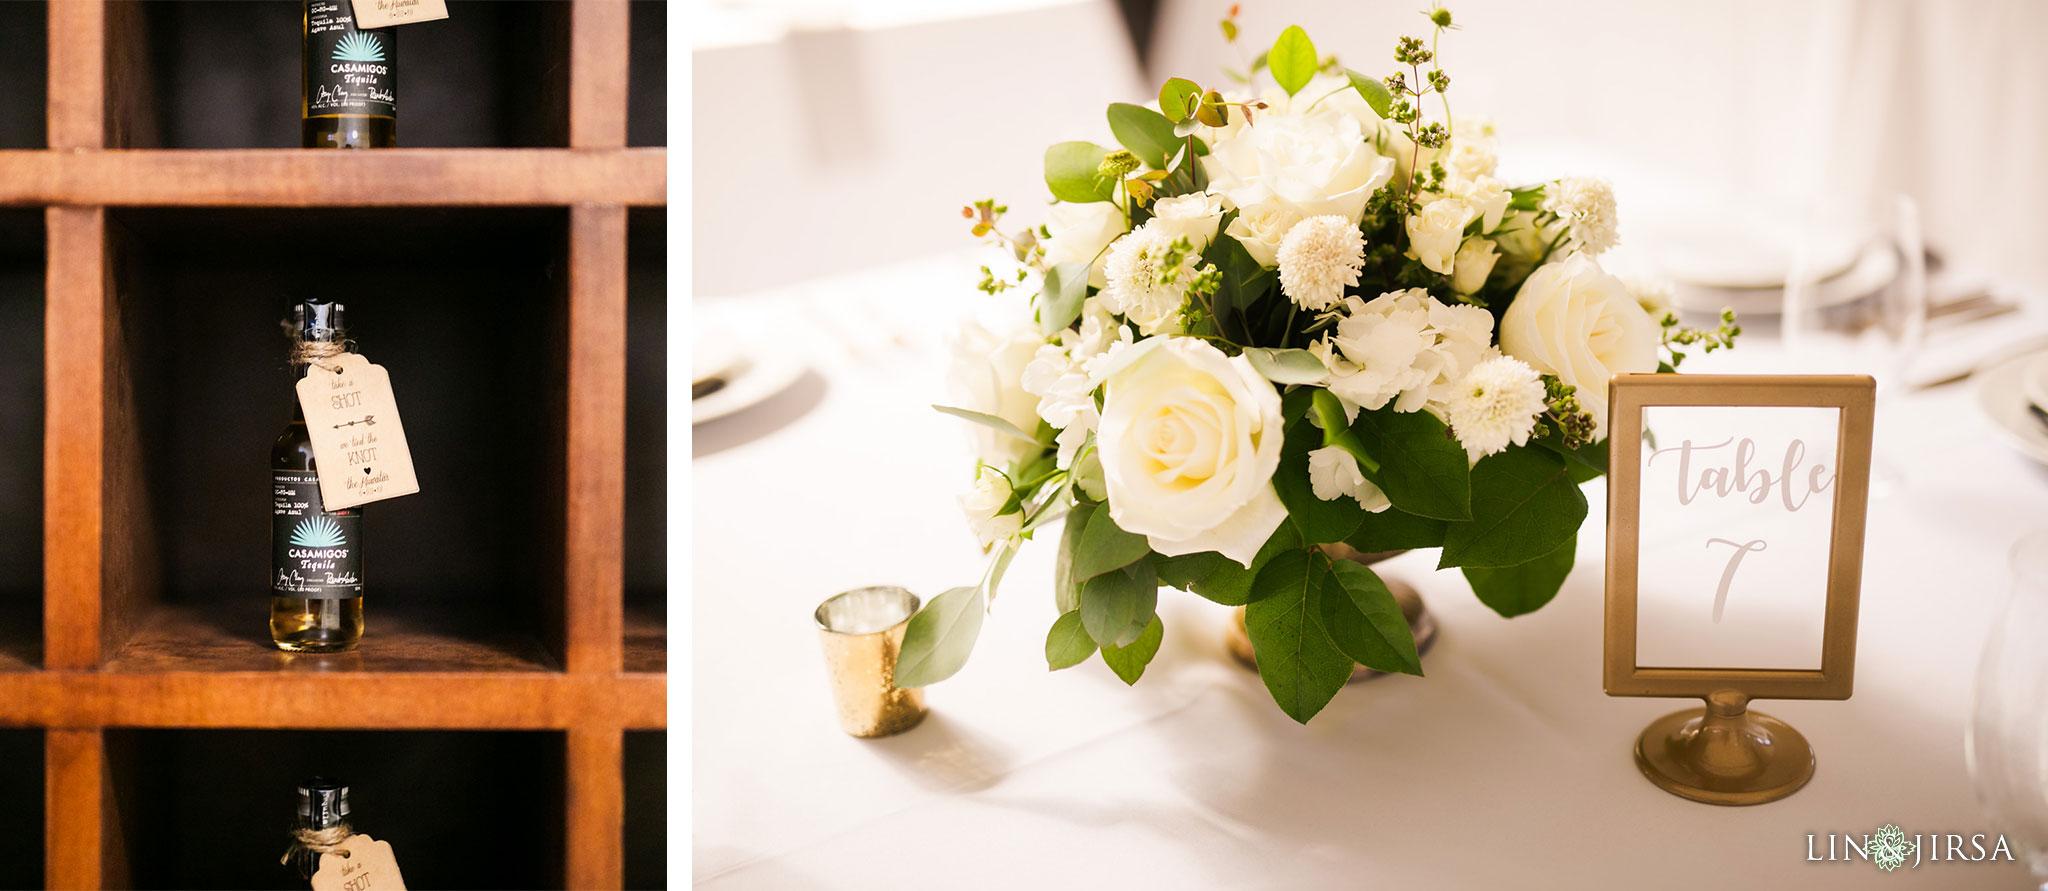 028 york manor los angeles wedding reception photography